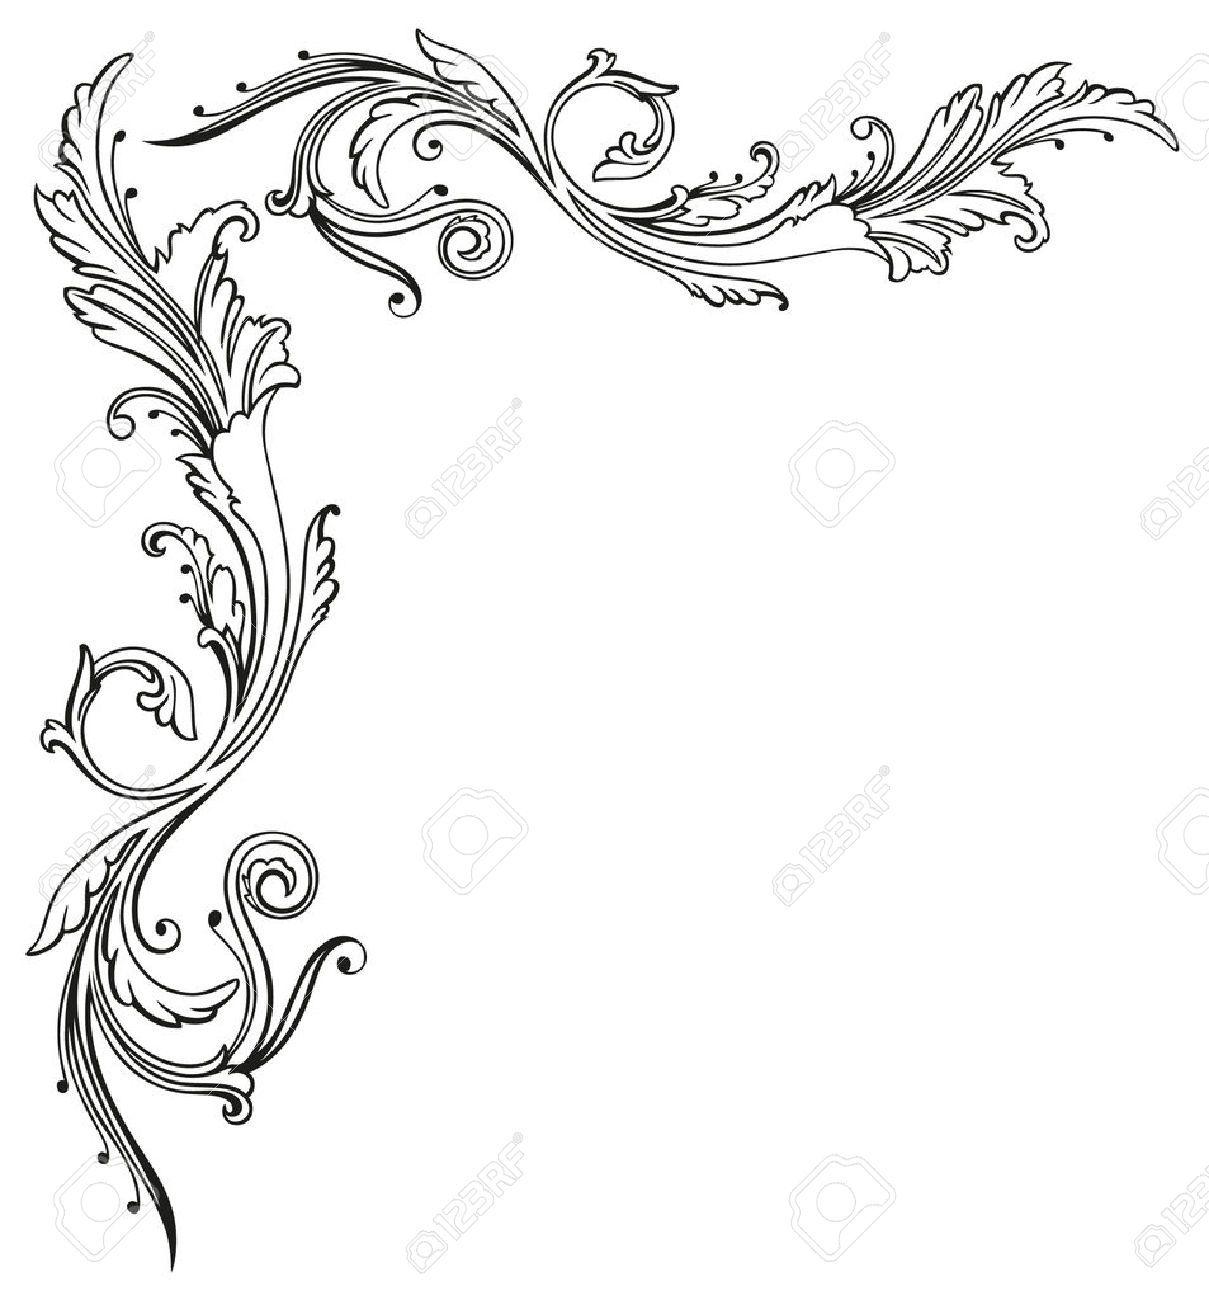 Retro Border Stencils : Vintage tendril floral and filigree border stock